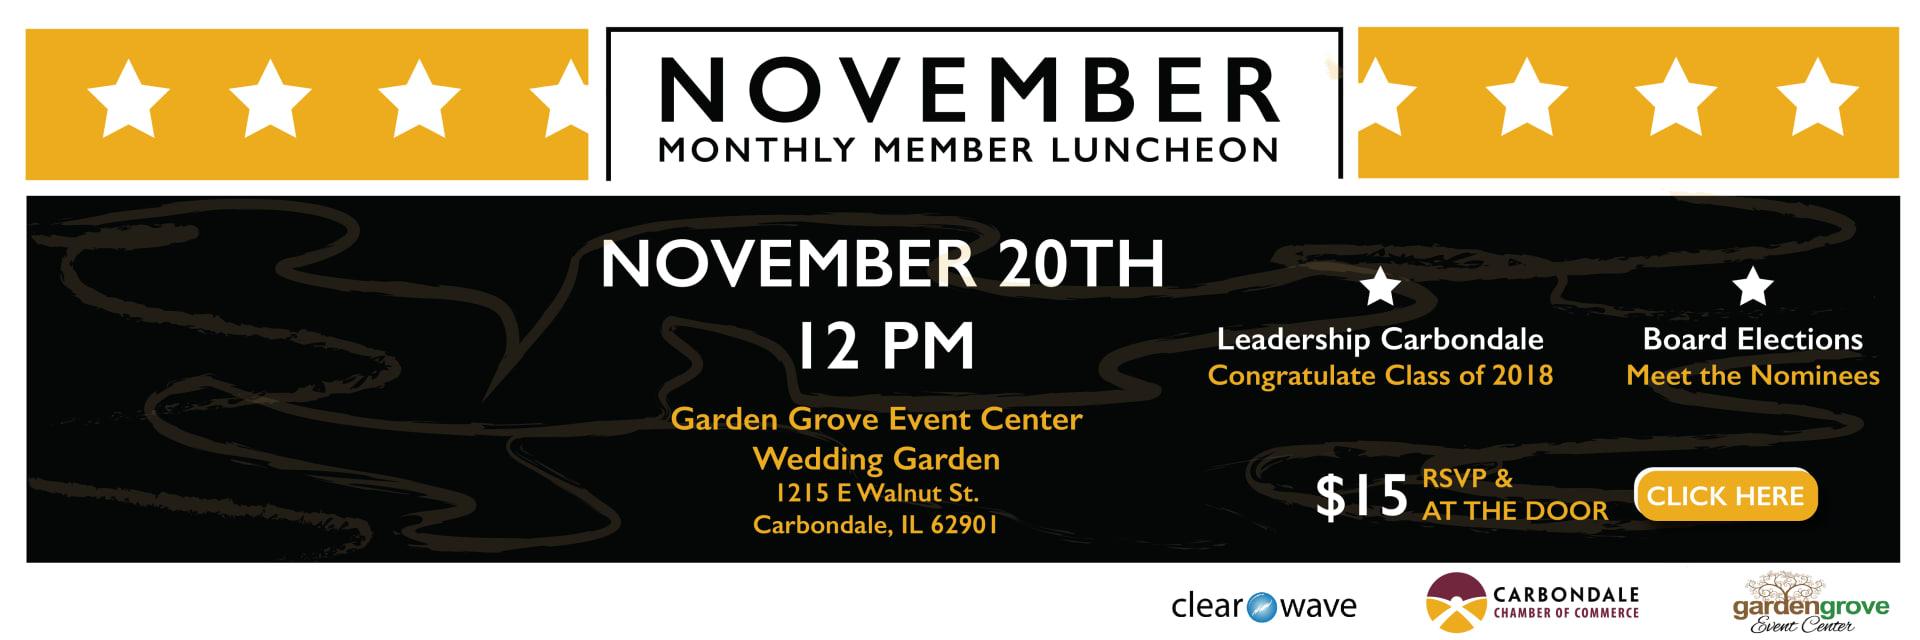 Nov_Luncheon_Slider-w1920.jpg